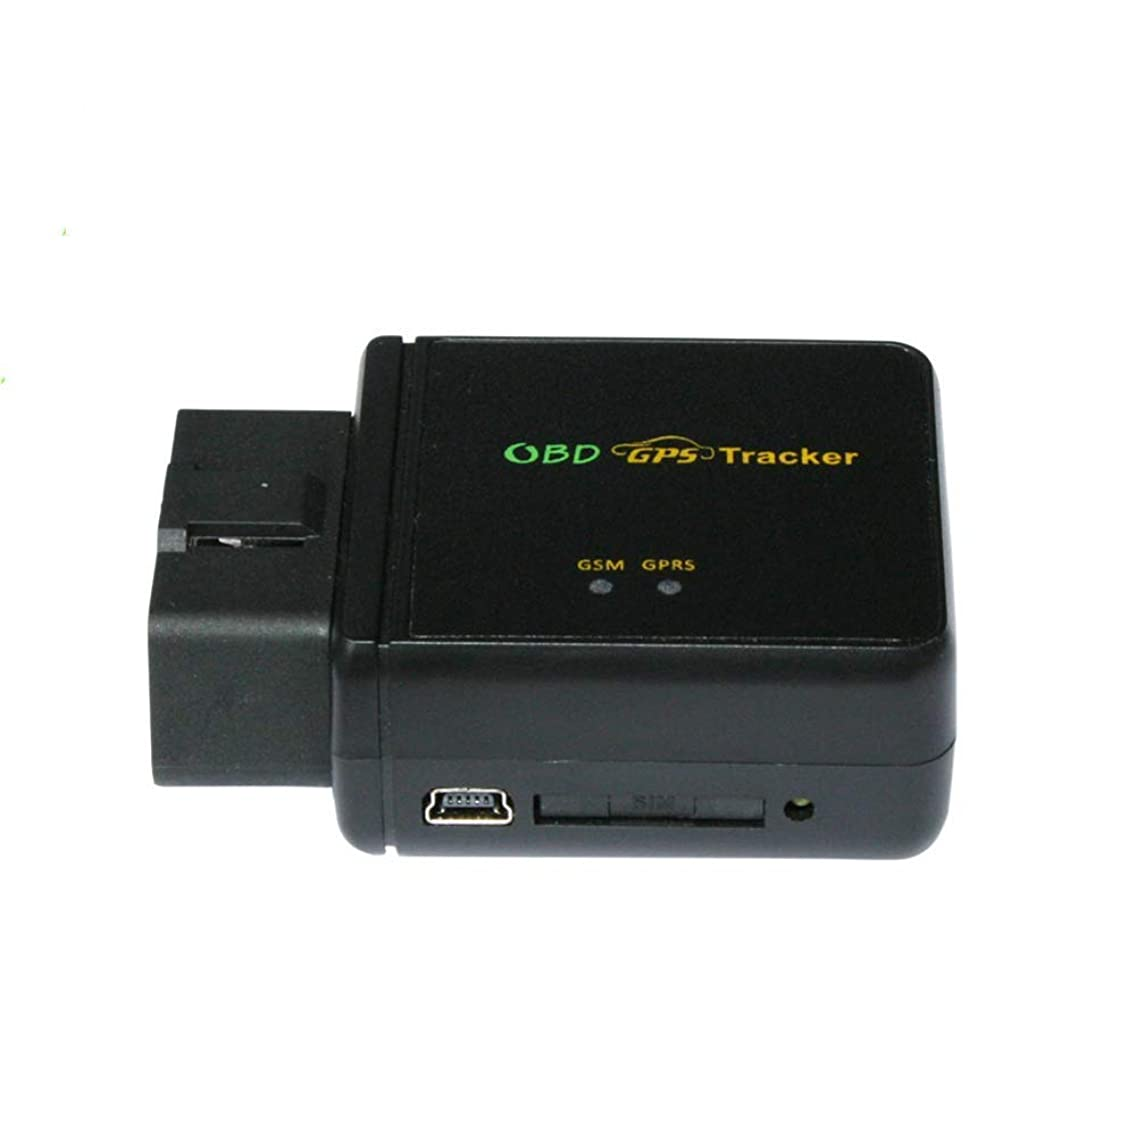 Casavidas CCTR-830G OBD 3G GPS Locator GPS Monitoring Tracker Supports Remote Power Failure Alarm